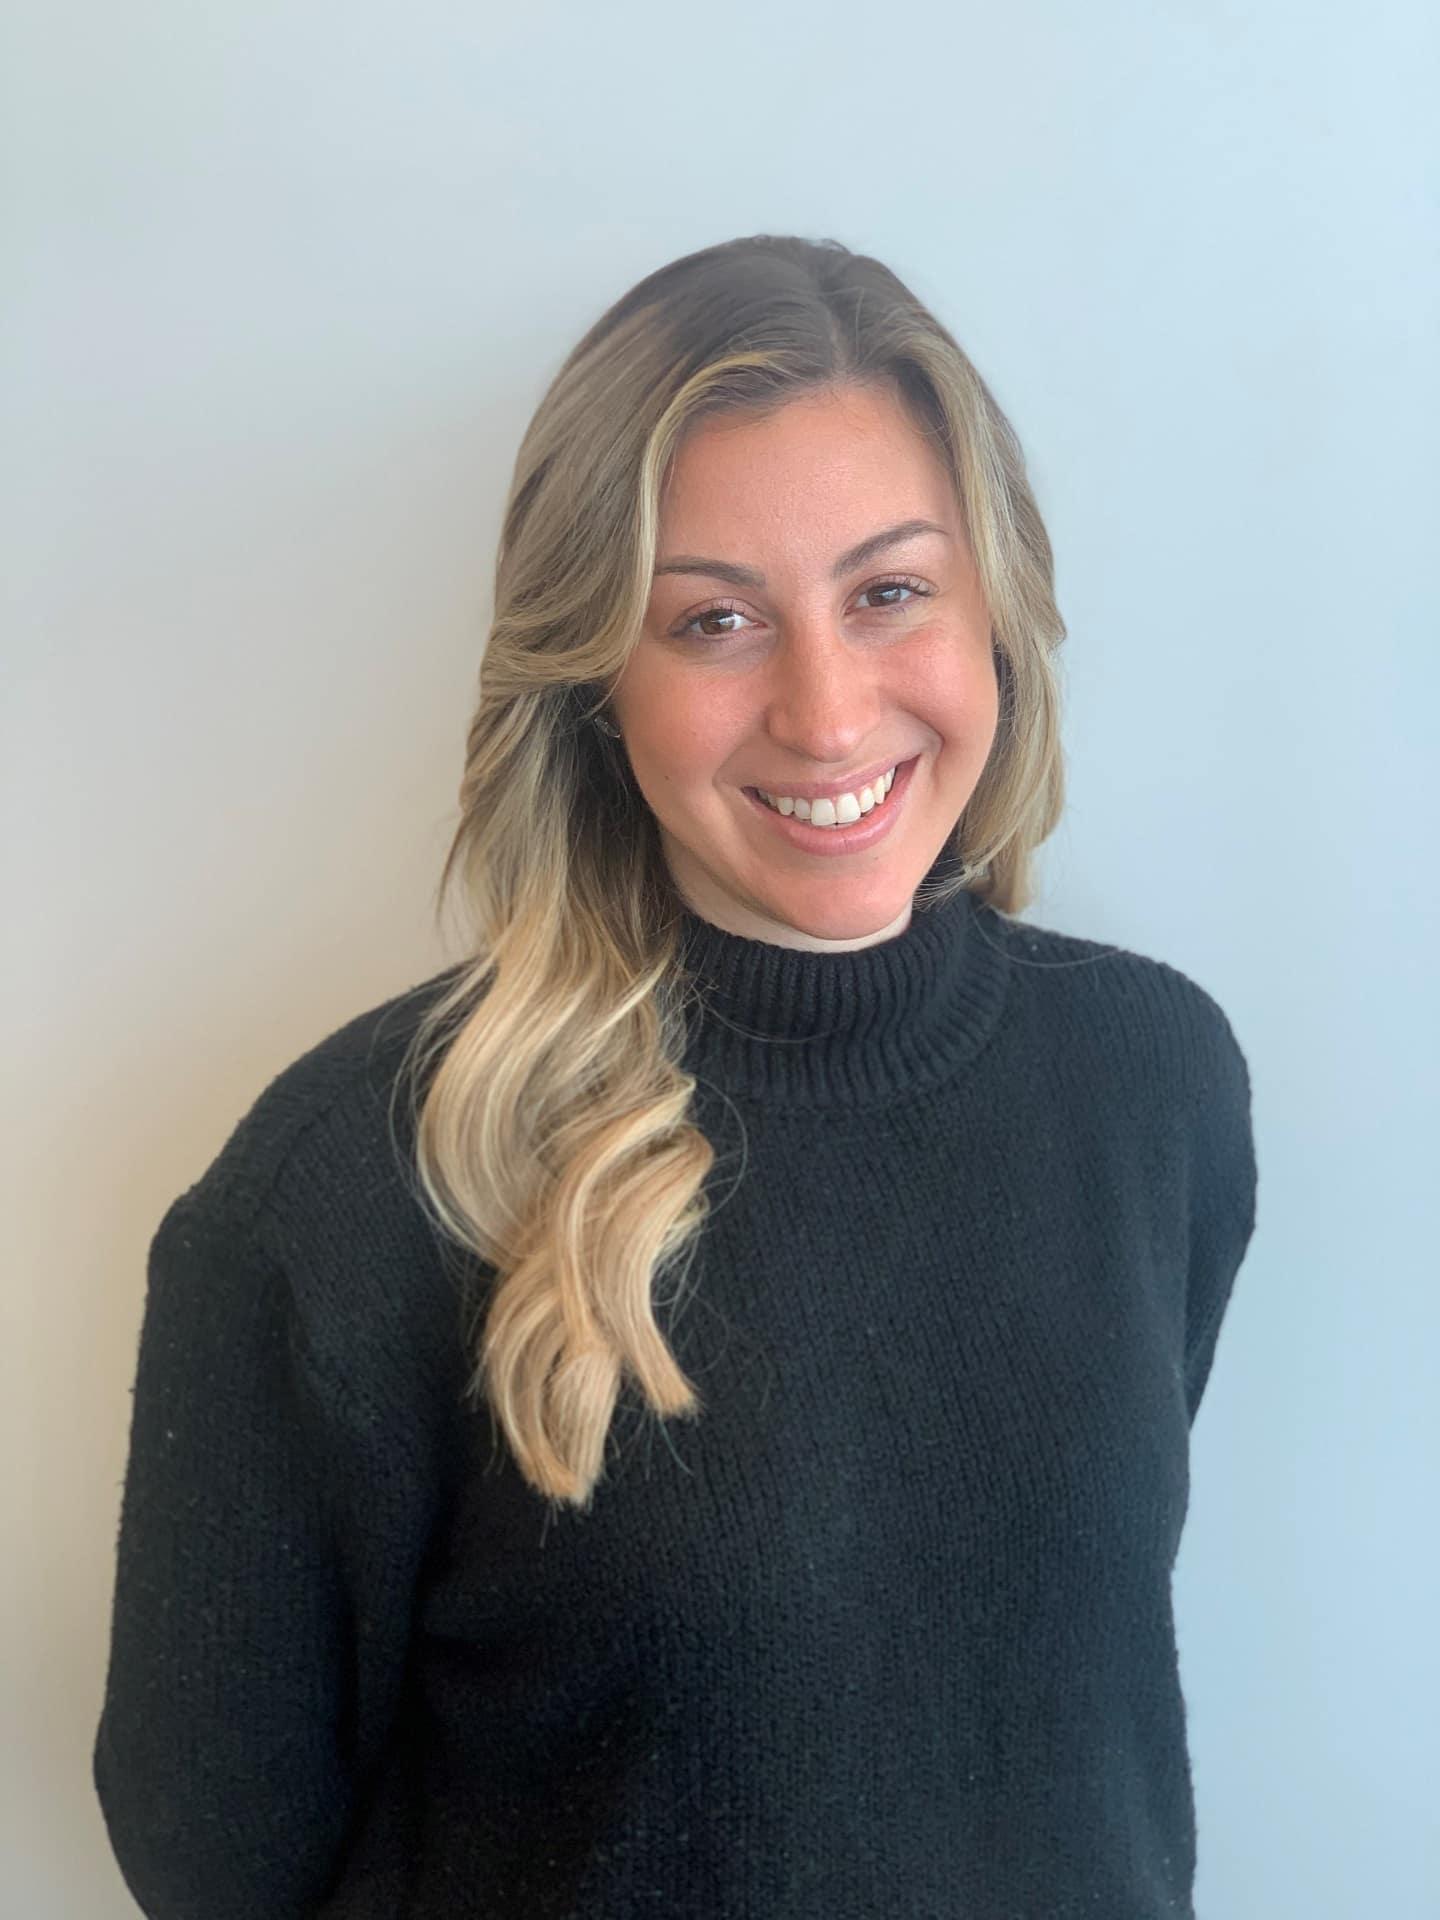 Jessica Schad